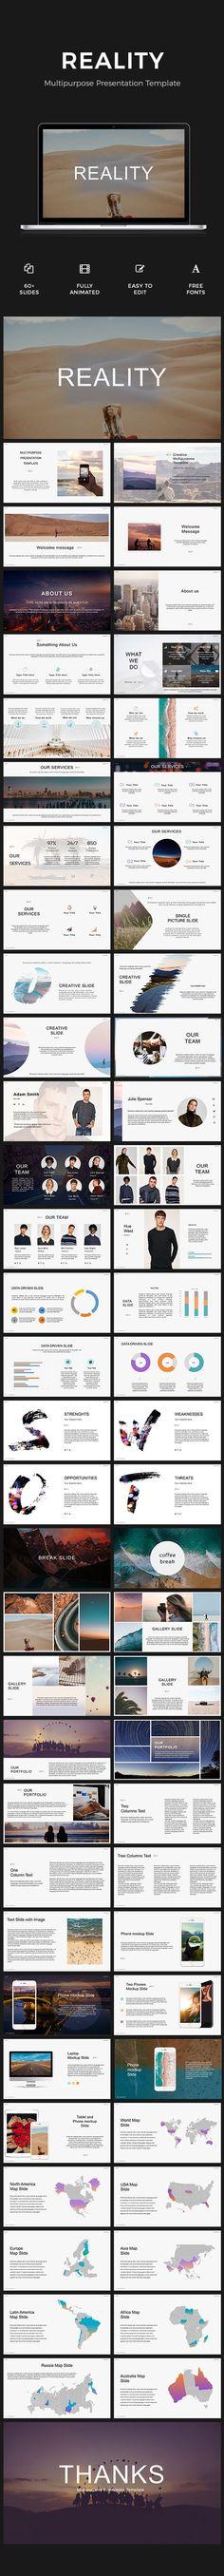 Reality Presentation - #PowerPoint Templates Presentation Templates